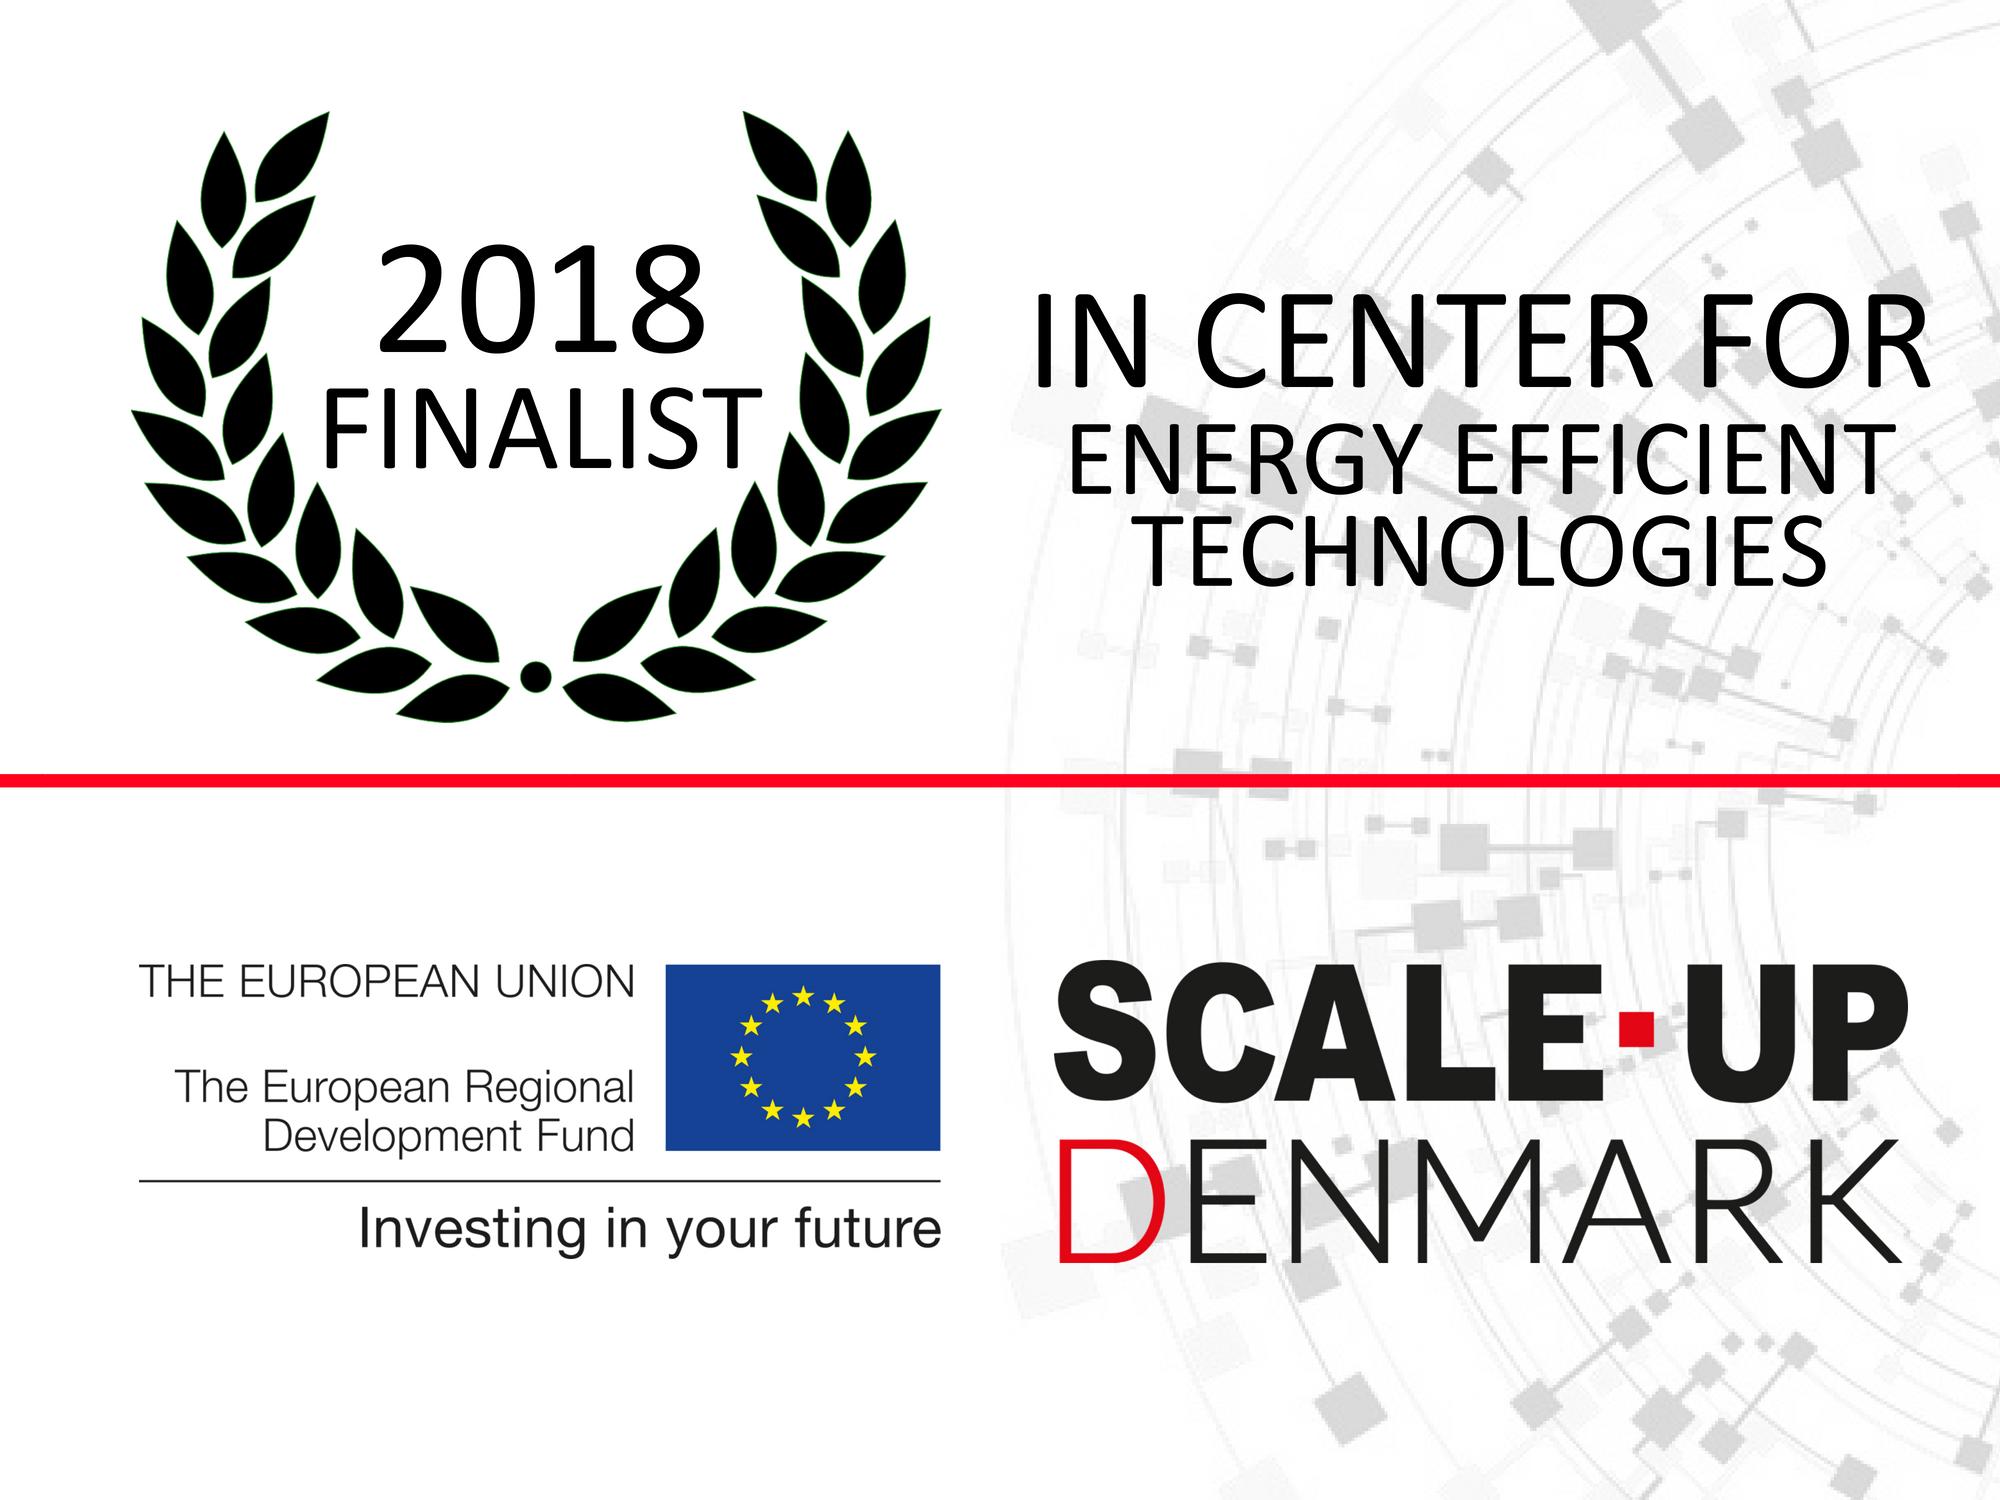 finalist 2018, energy efficient technologies, scale up denmark